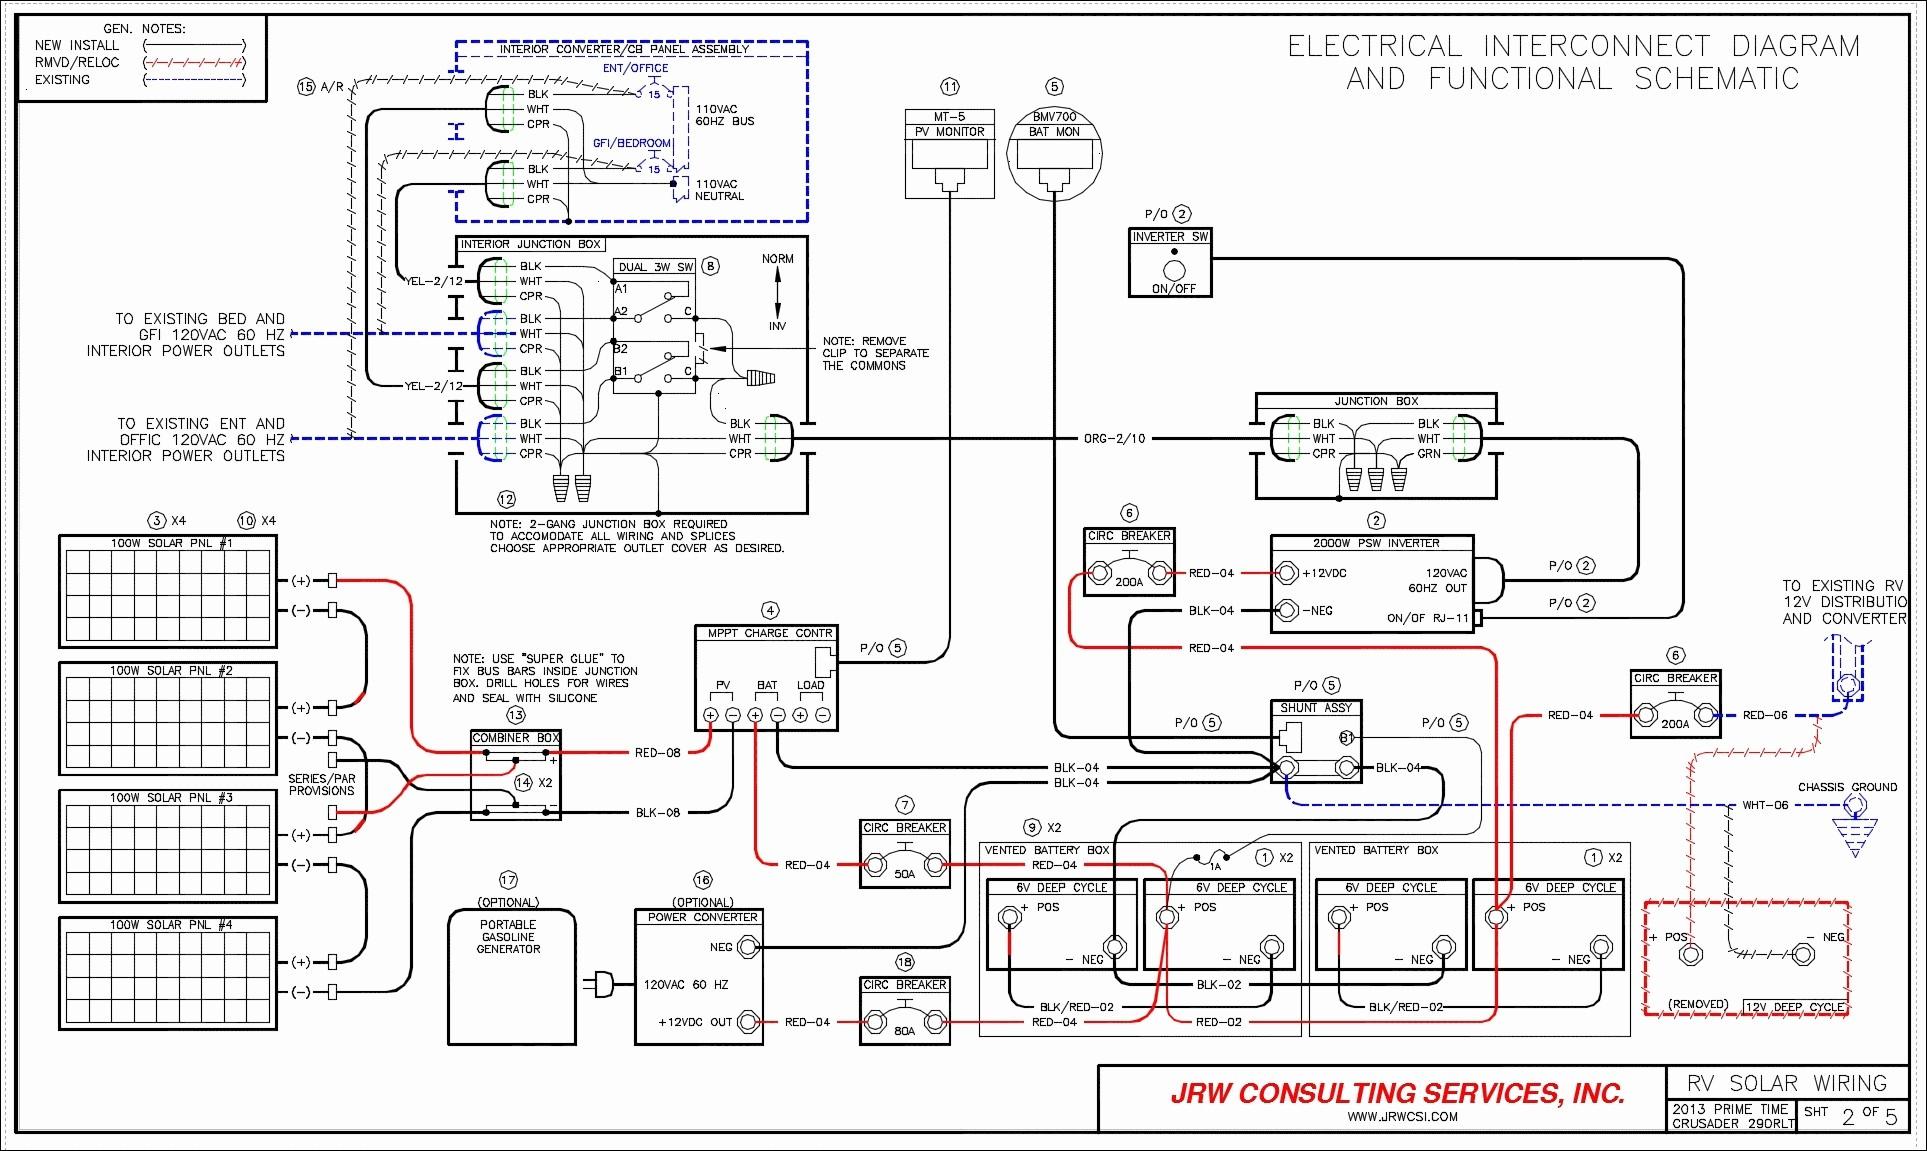 Dish Network Satellite Wiring Diagram Luxury Keystone Rv Cable Tv Wiring Diagram Data Wiring Diagrams •